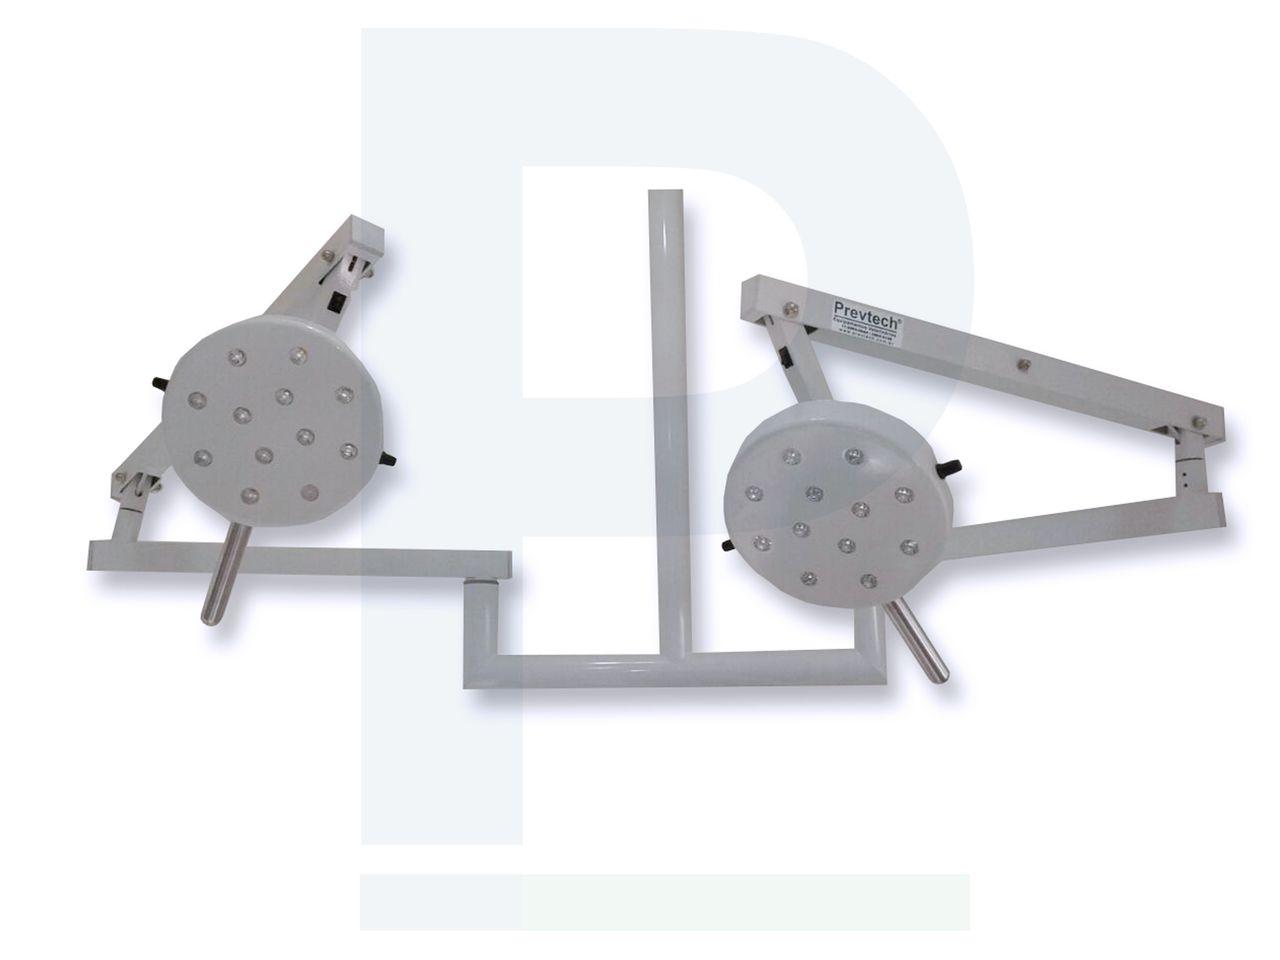 Foco Cirúrgico Duplo De Teto - 24 Leds 12X12 Cúpulas